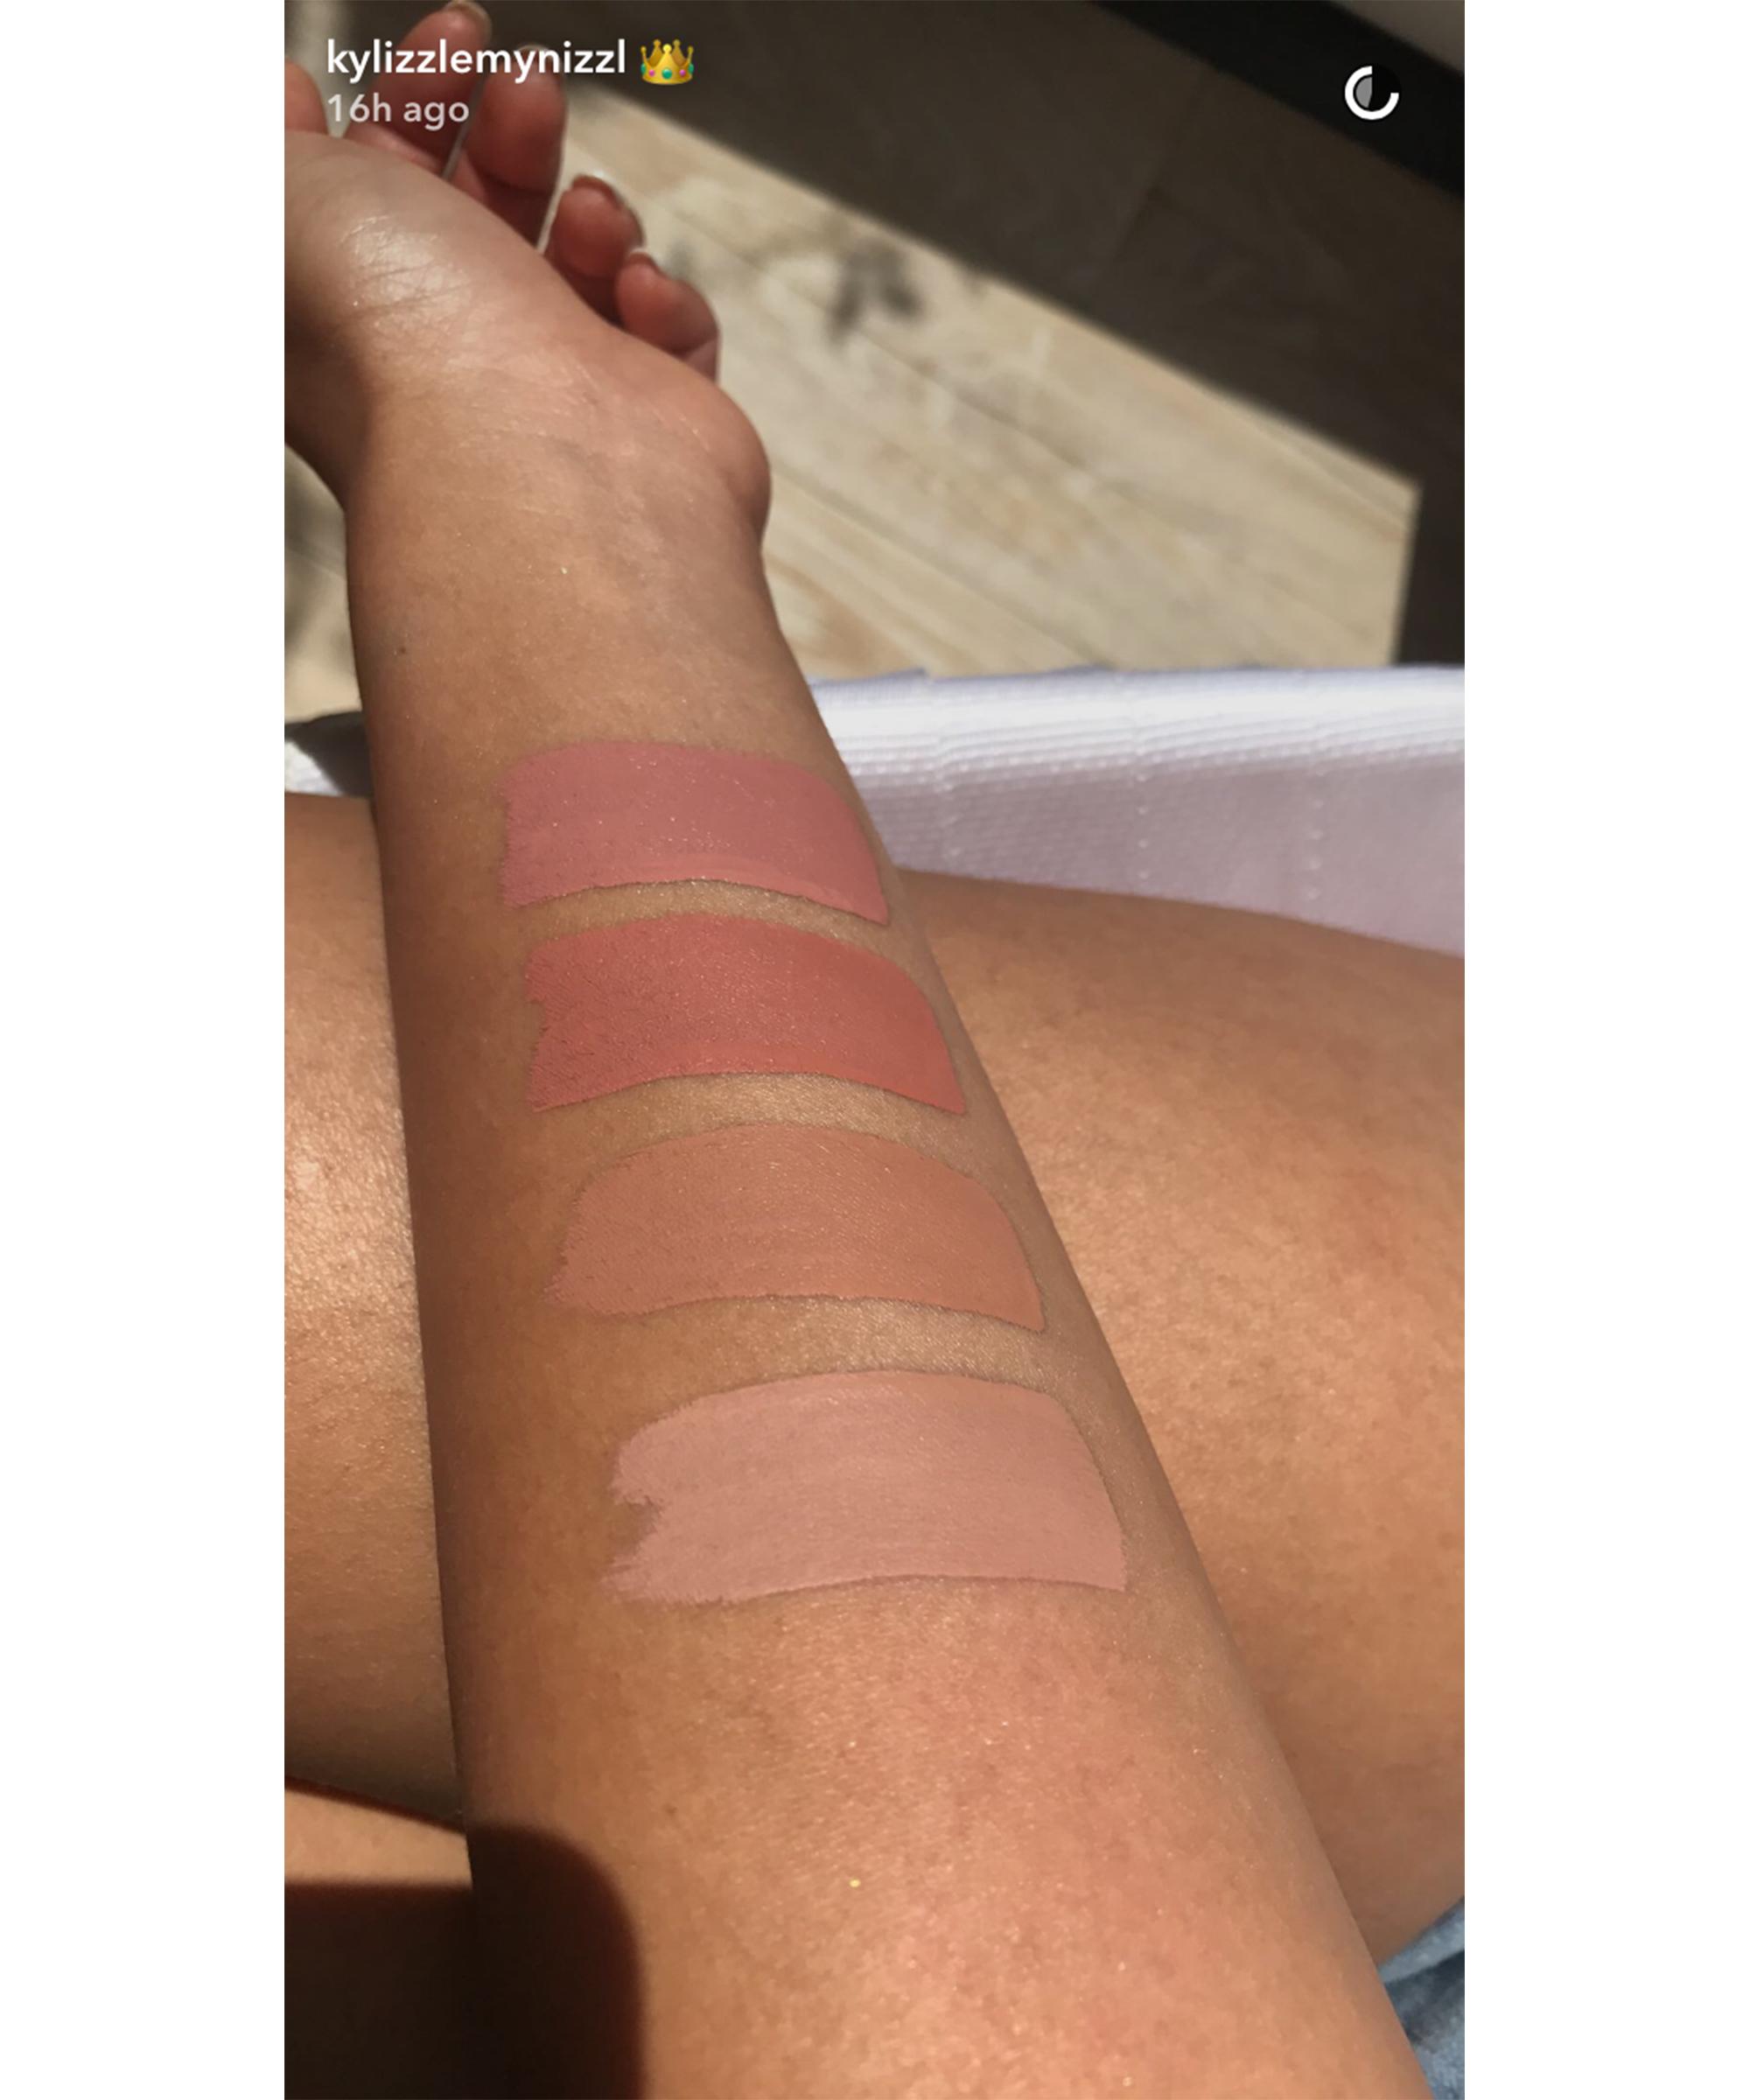 The Wet Set Pressed Illuminating Powder by Kylie Cosmetics #16